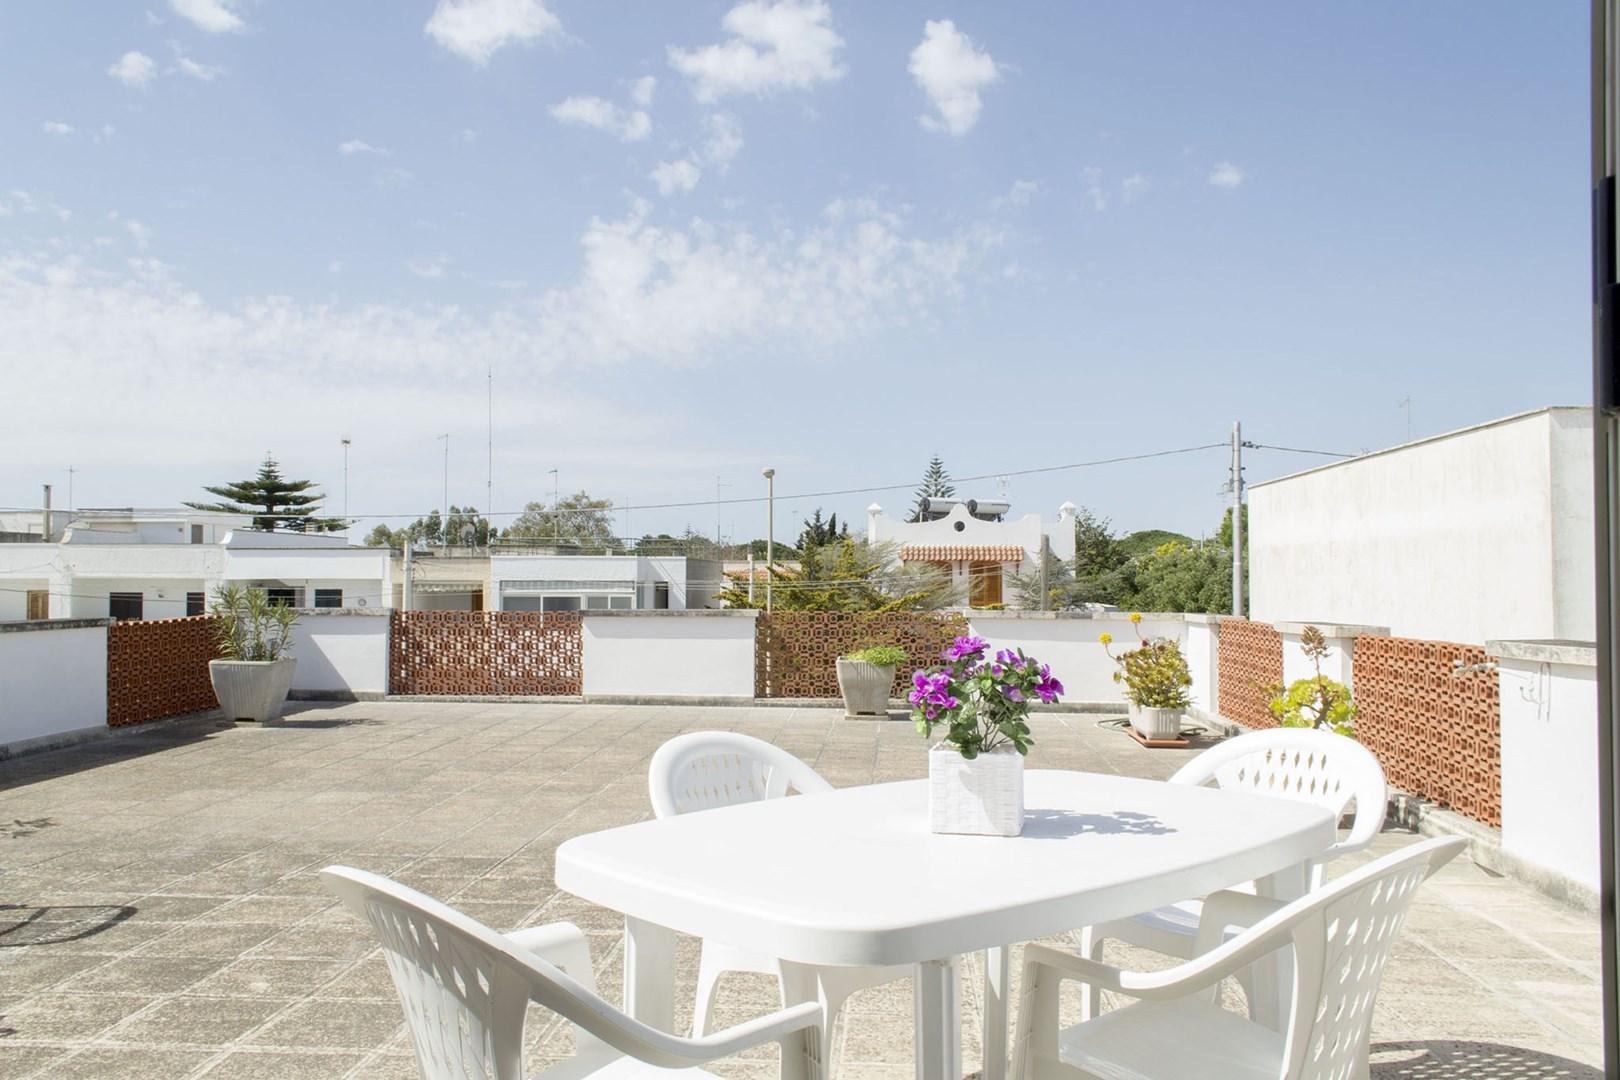 508_appartamento-lenin_terrazzo.jpg